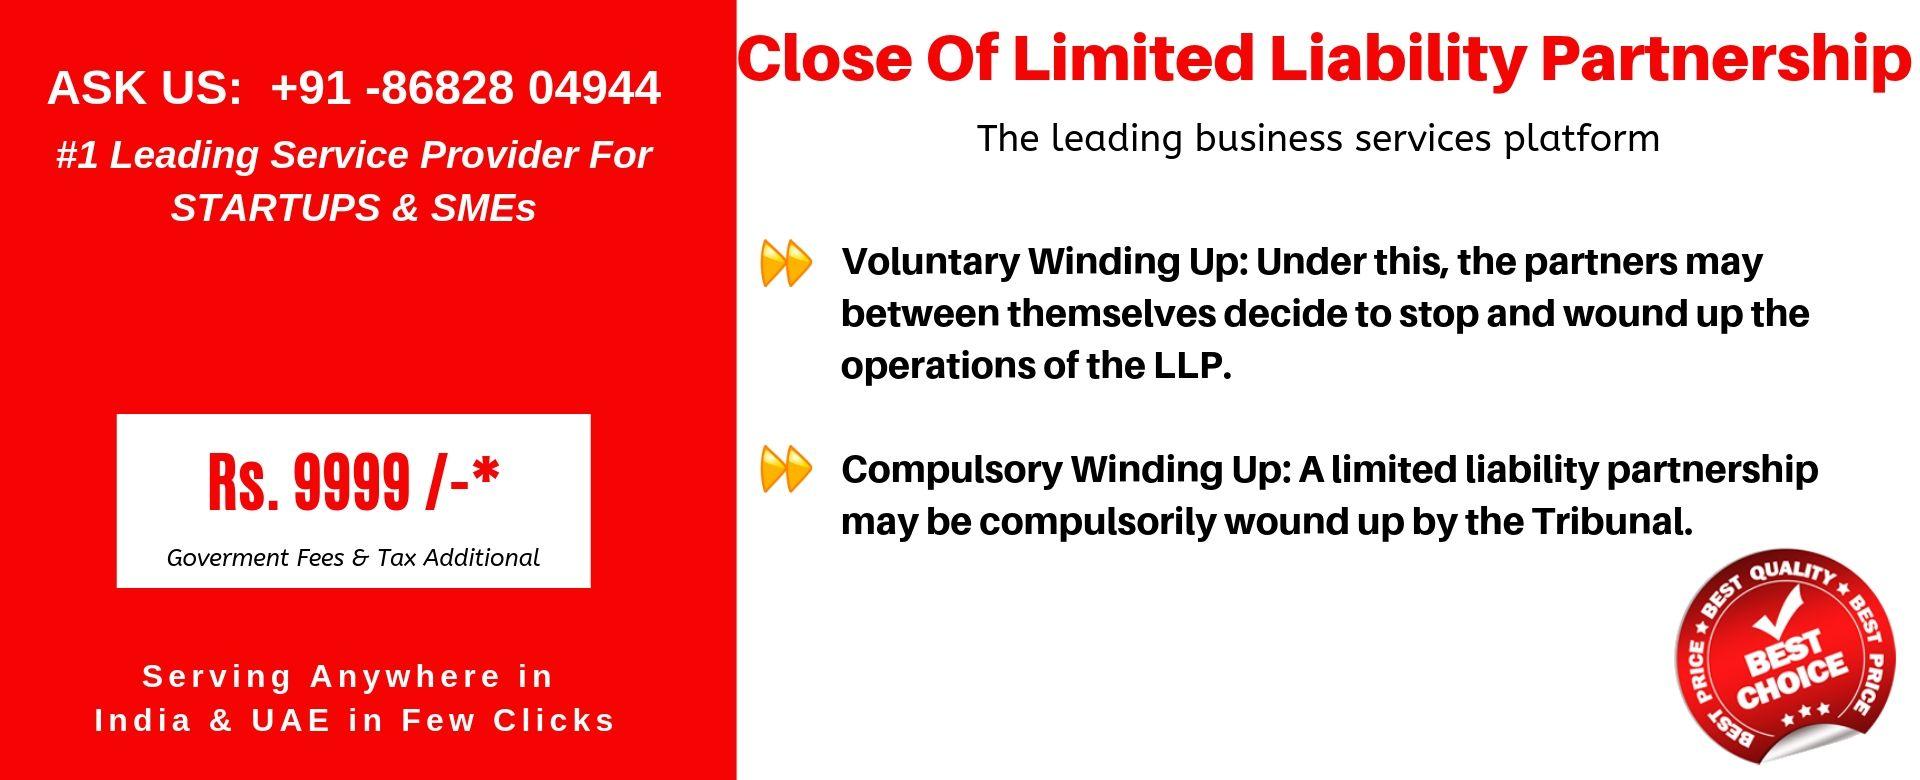 closure of llp in india